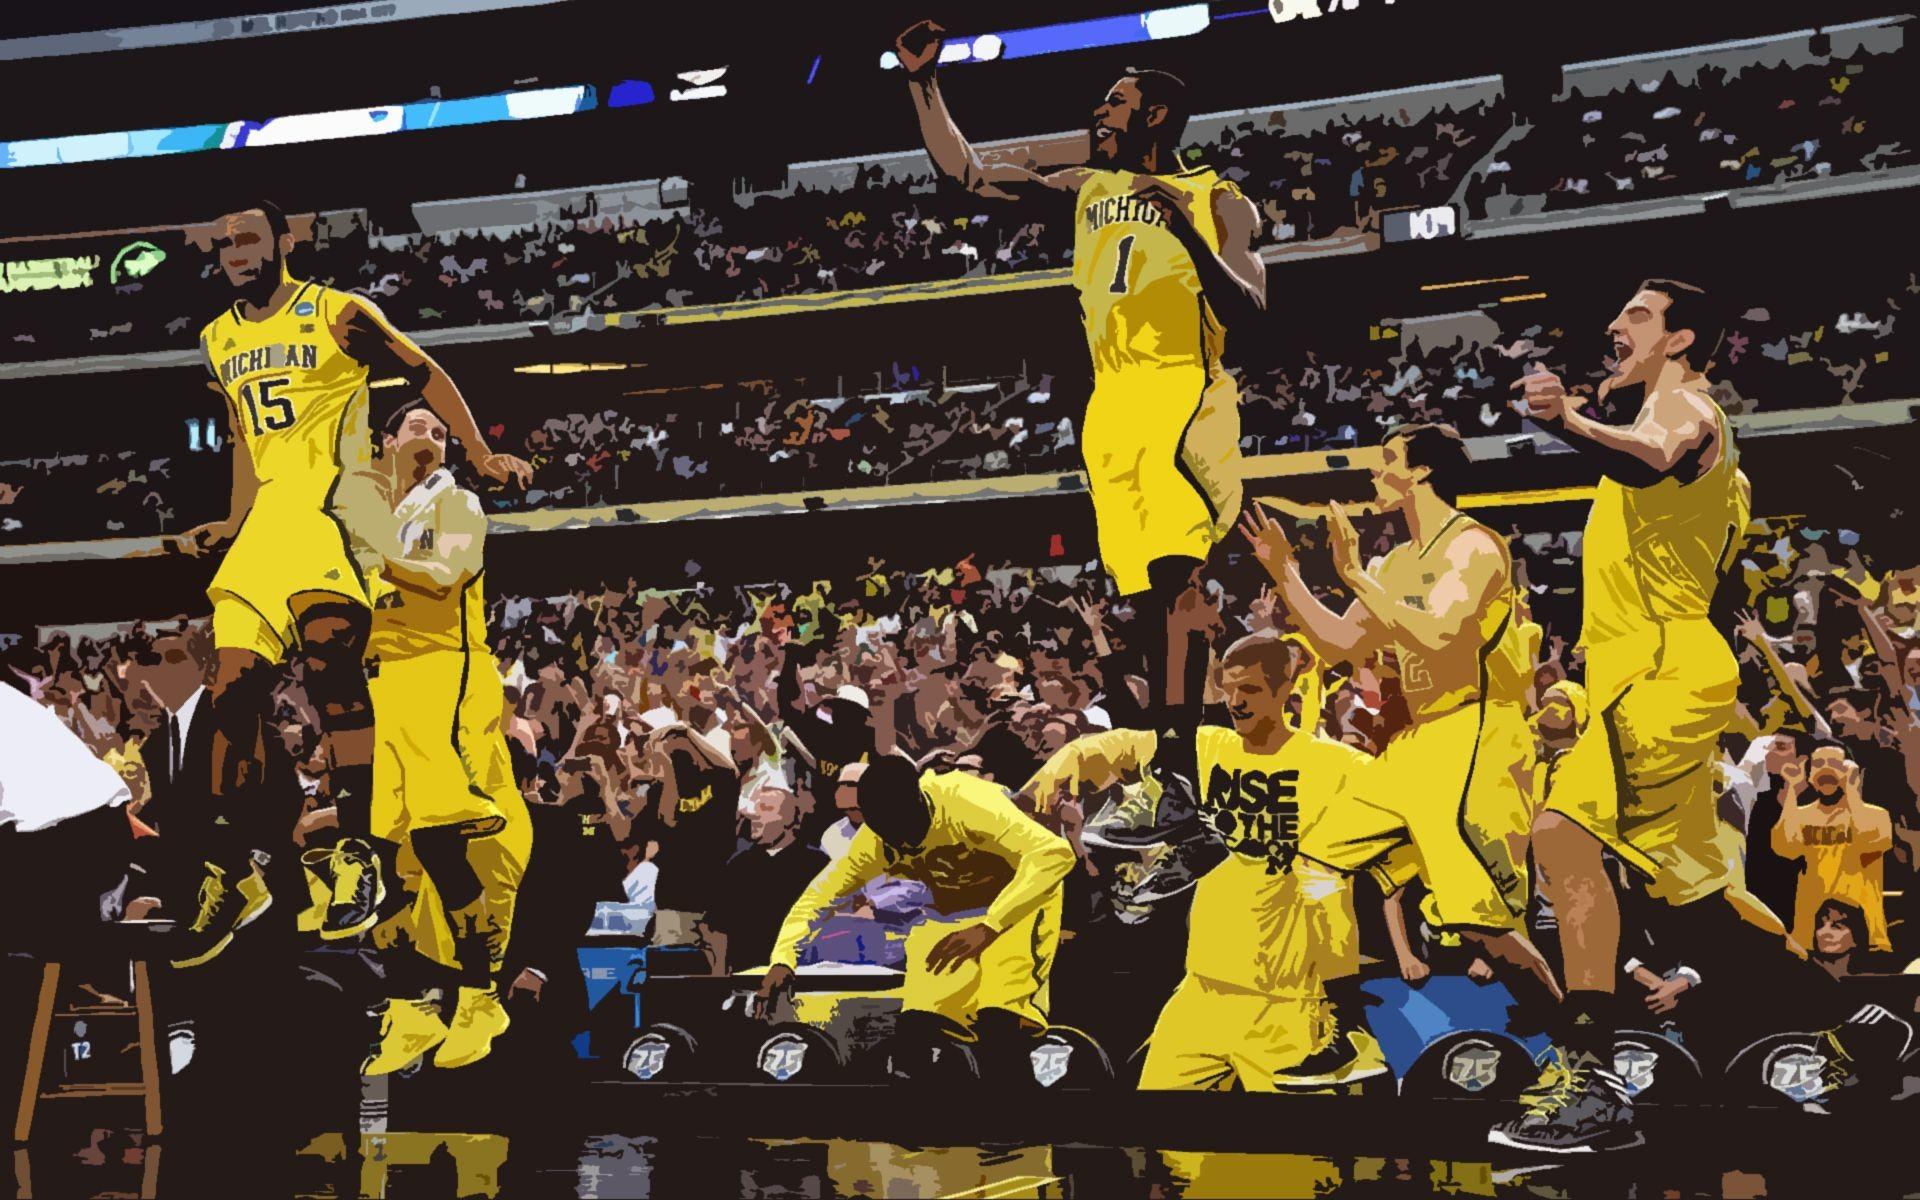 Michigan Basketball Backgrounds 2013-14 | mgoblog